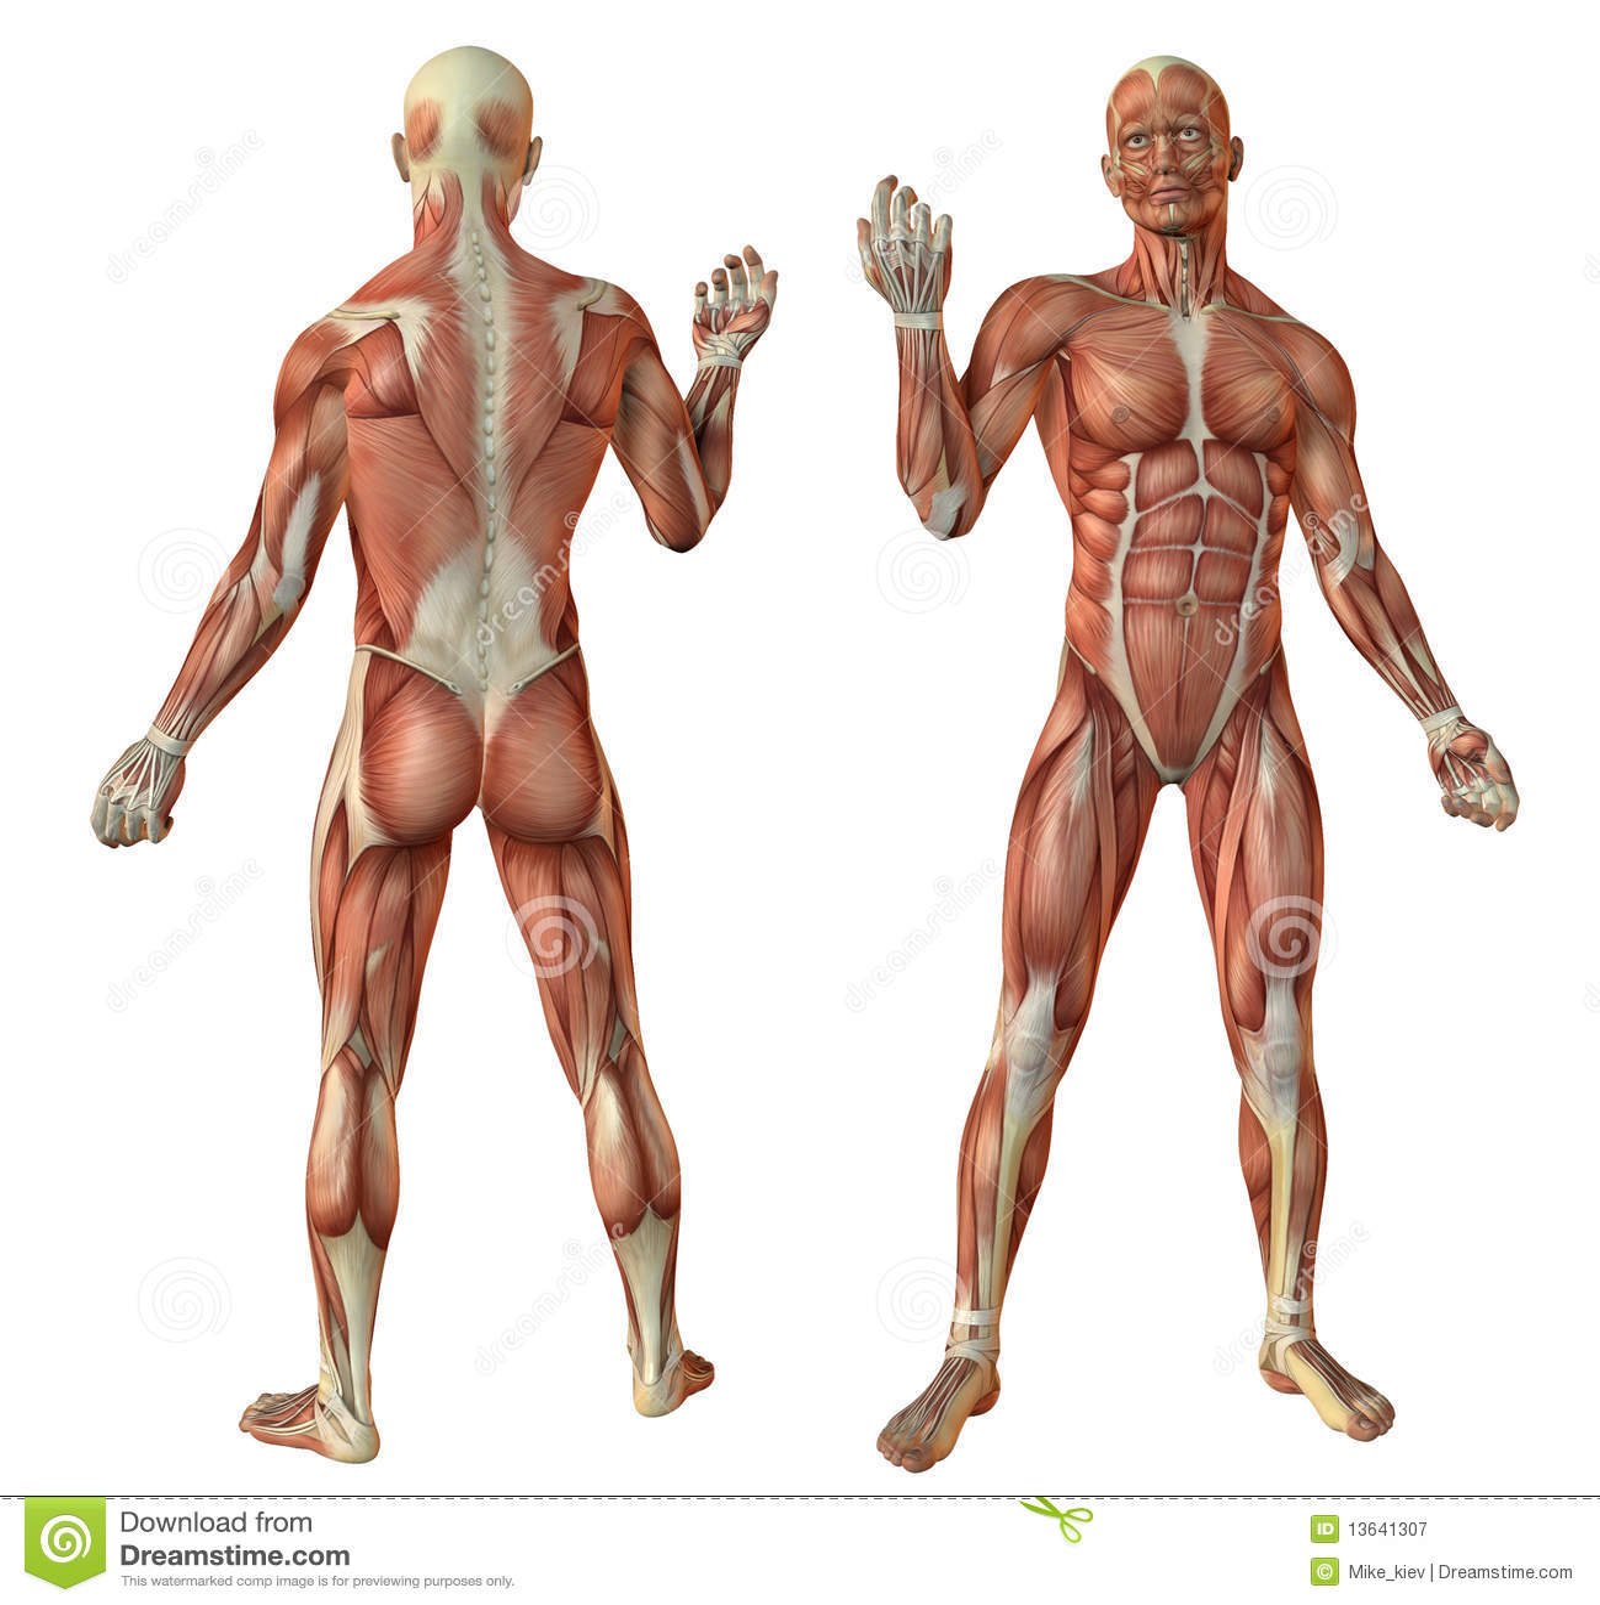 Neurologie: Homosexuelles Hirn - Spektrum der Wissenschaft